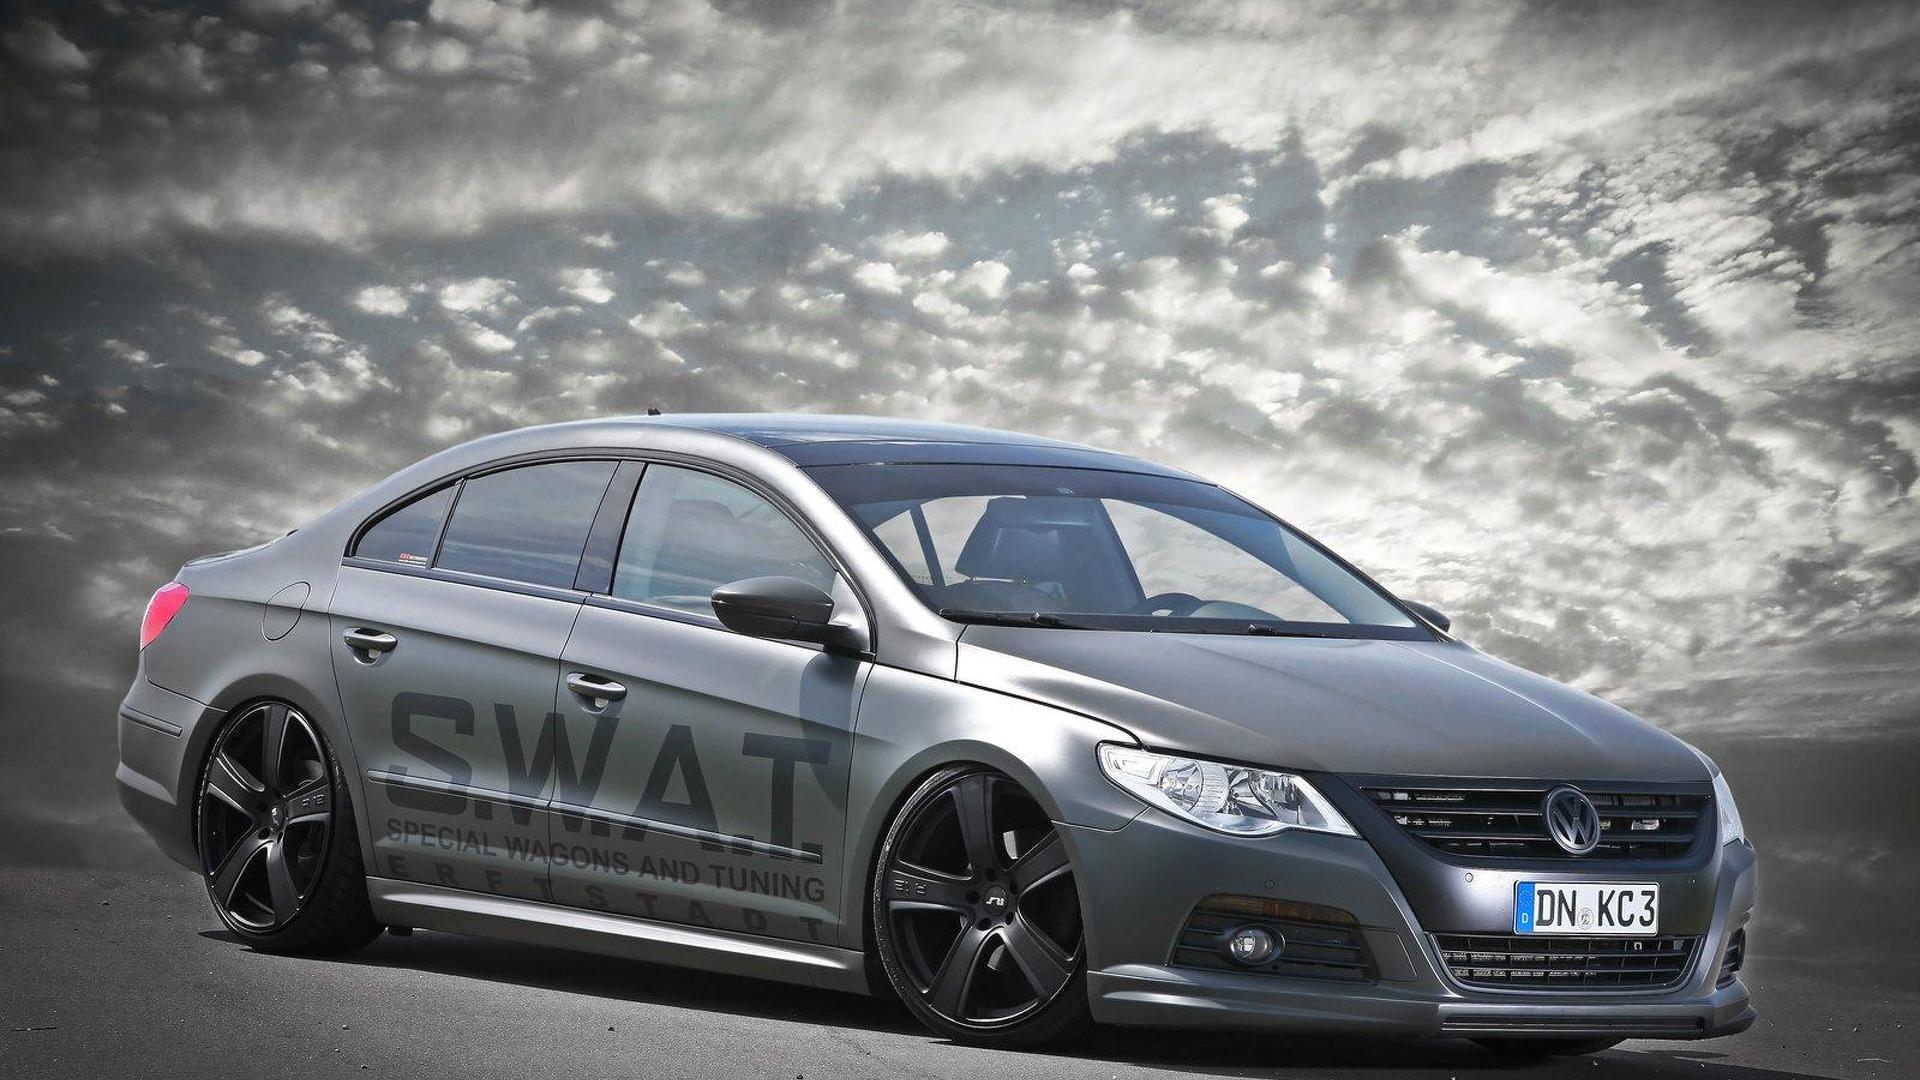 VW Passat CC tuned by KBR Motorsport